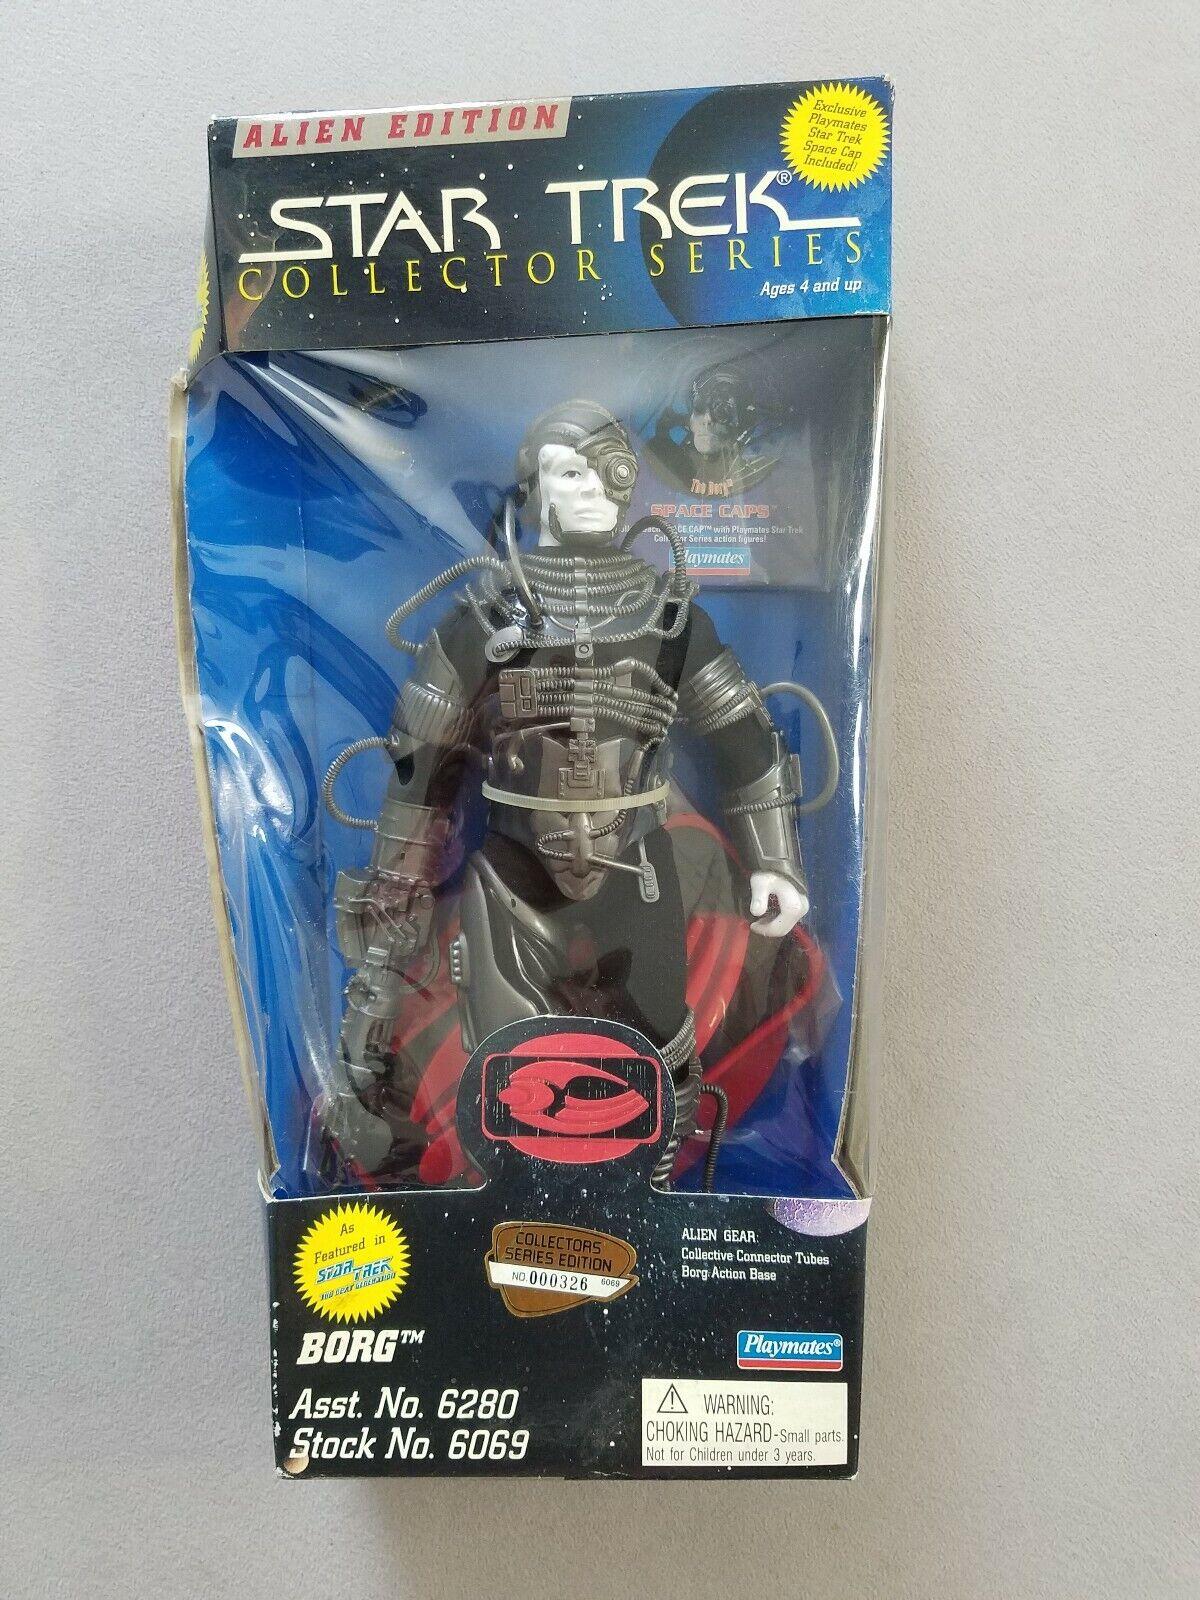 Alien Edition Star Trek Collector Series Borg 9 Inch Figure